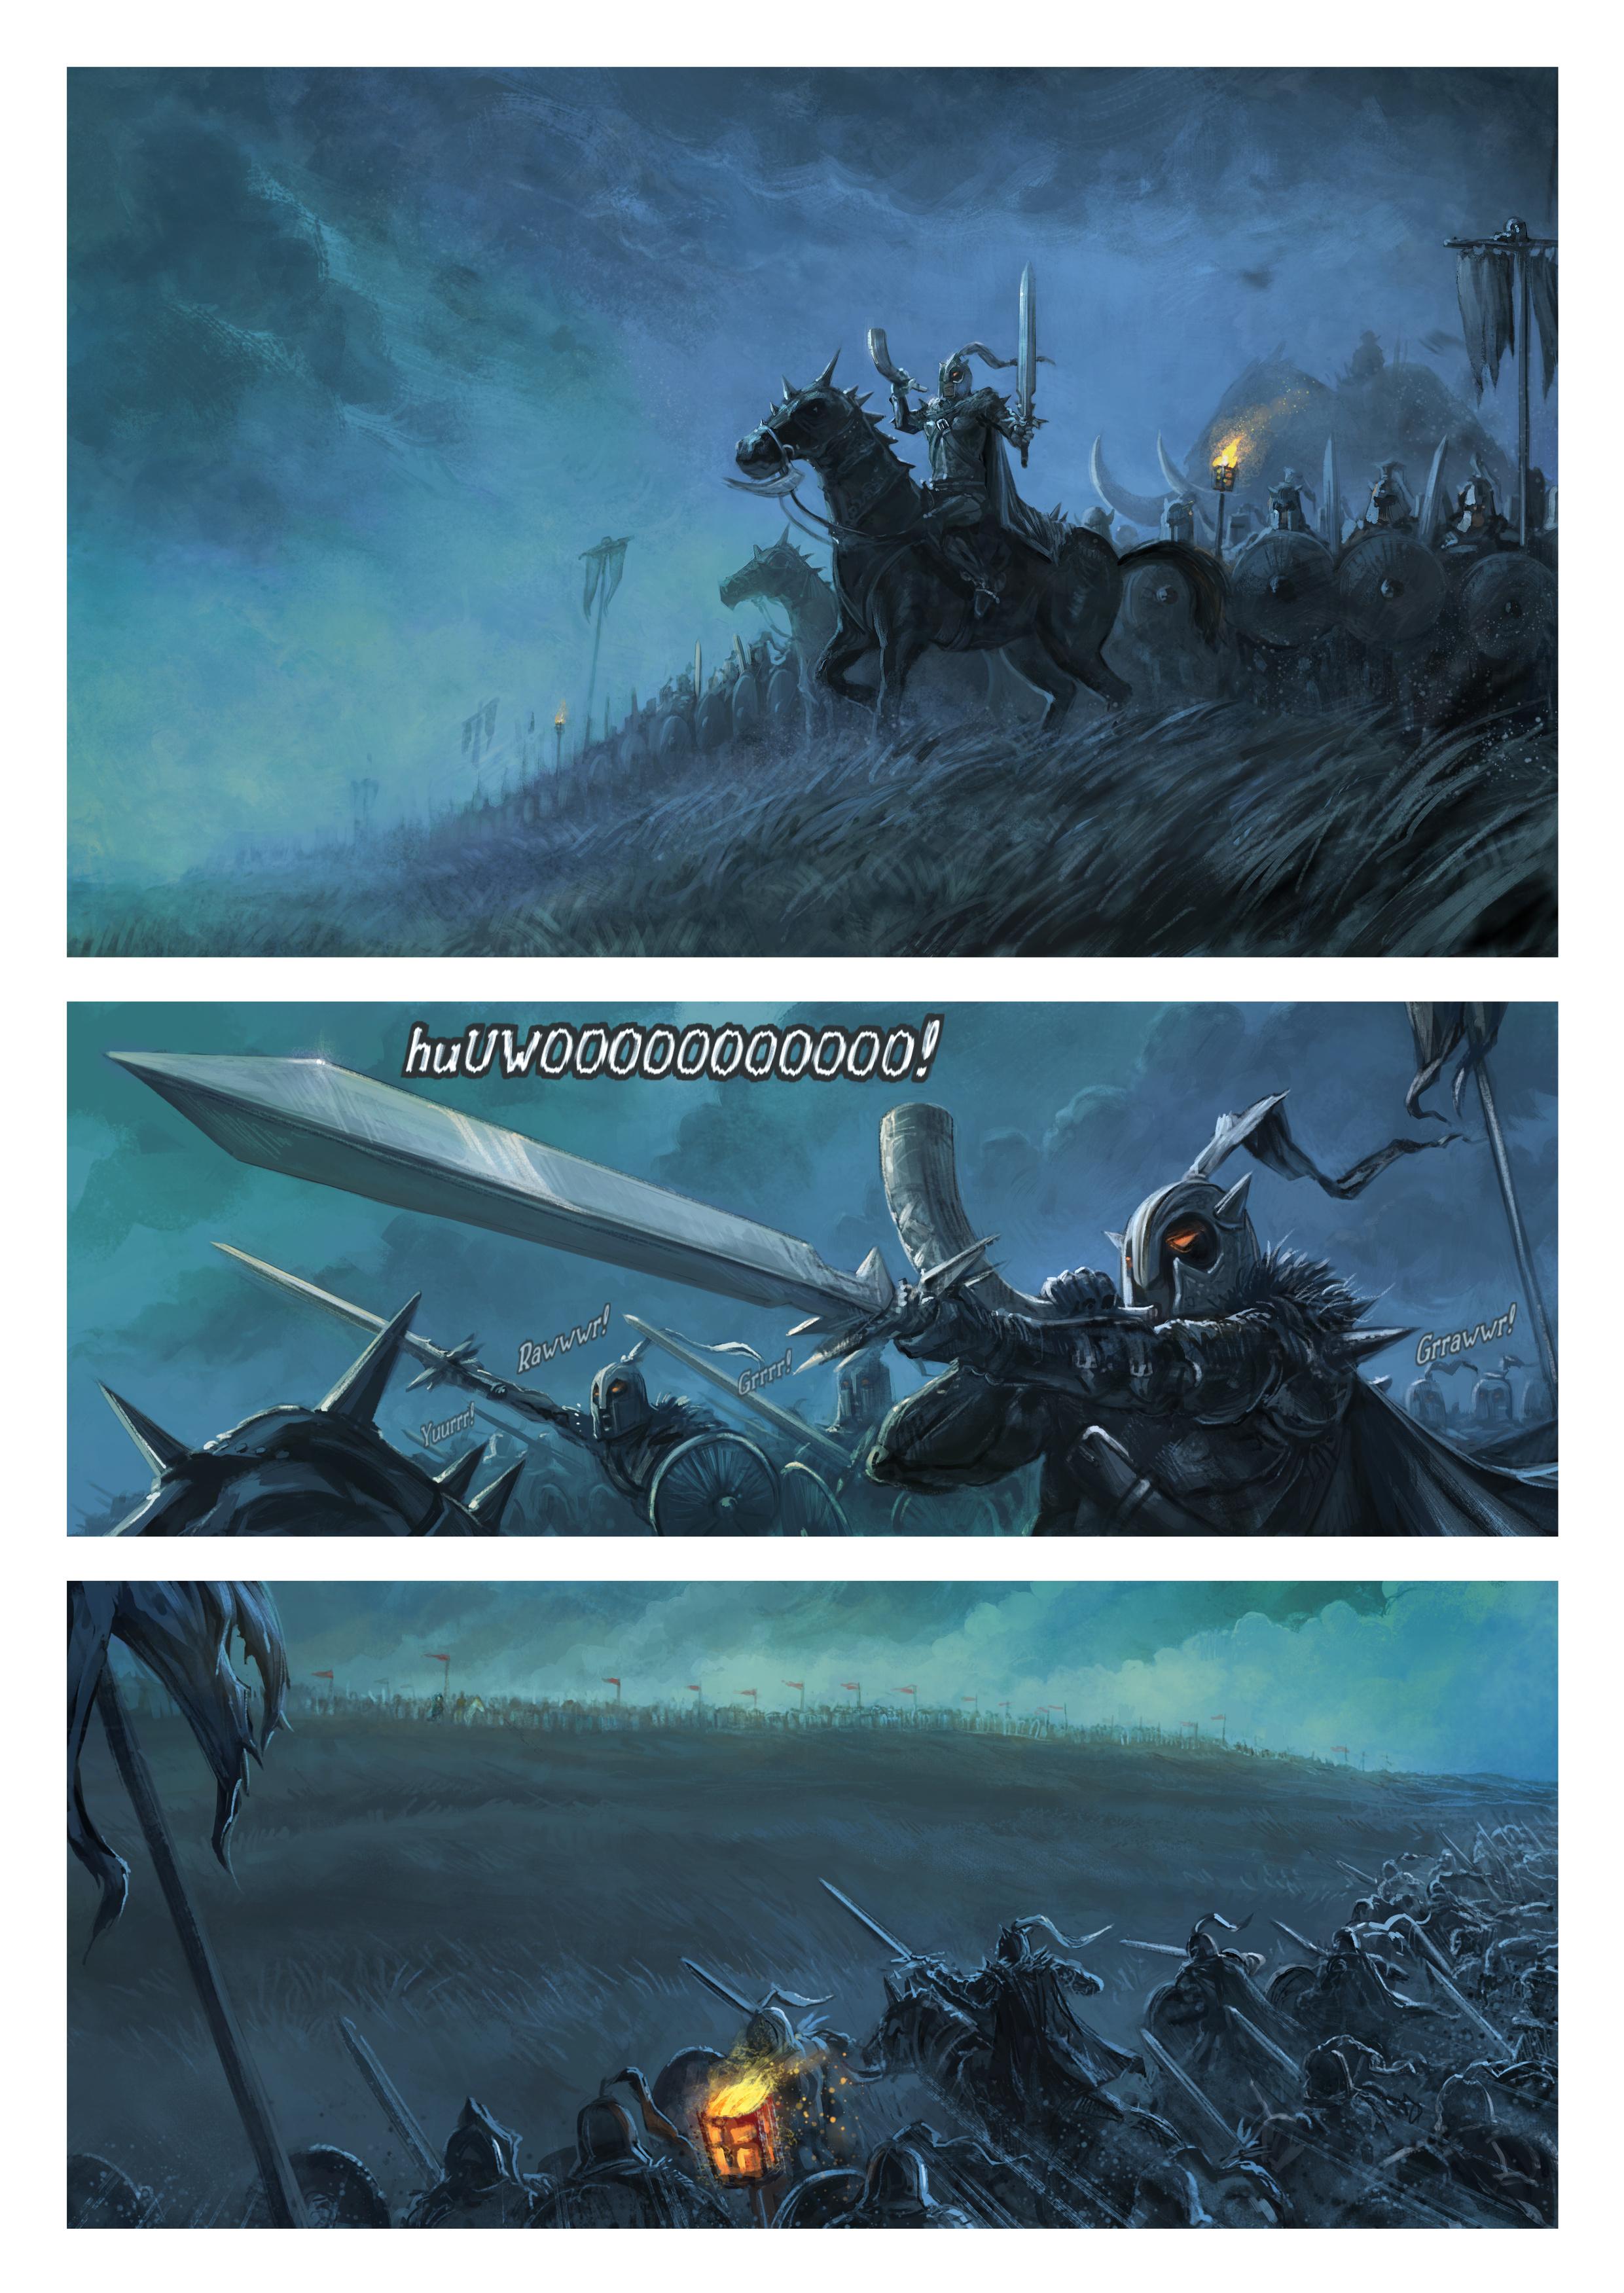 Episode 33: Mantra Perang, Page 1